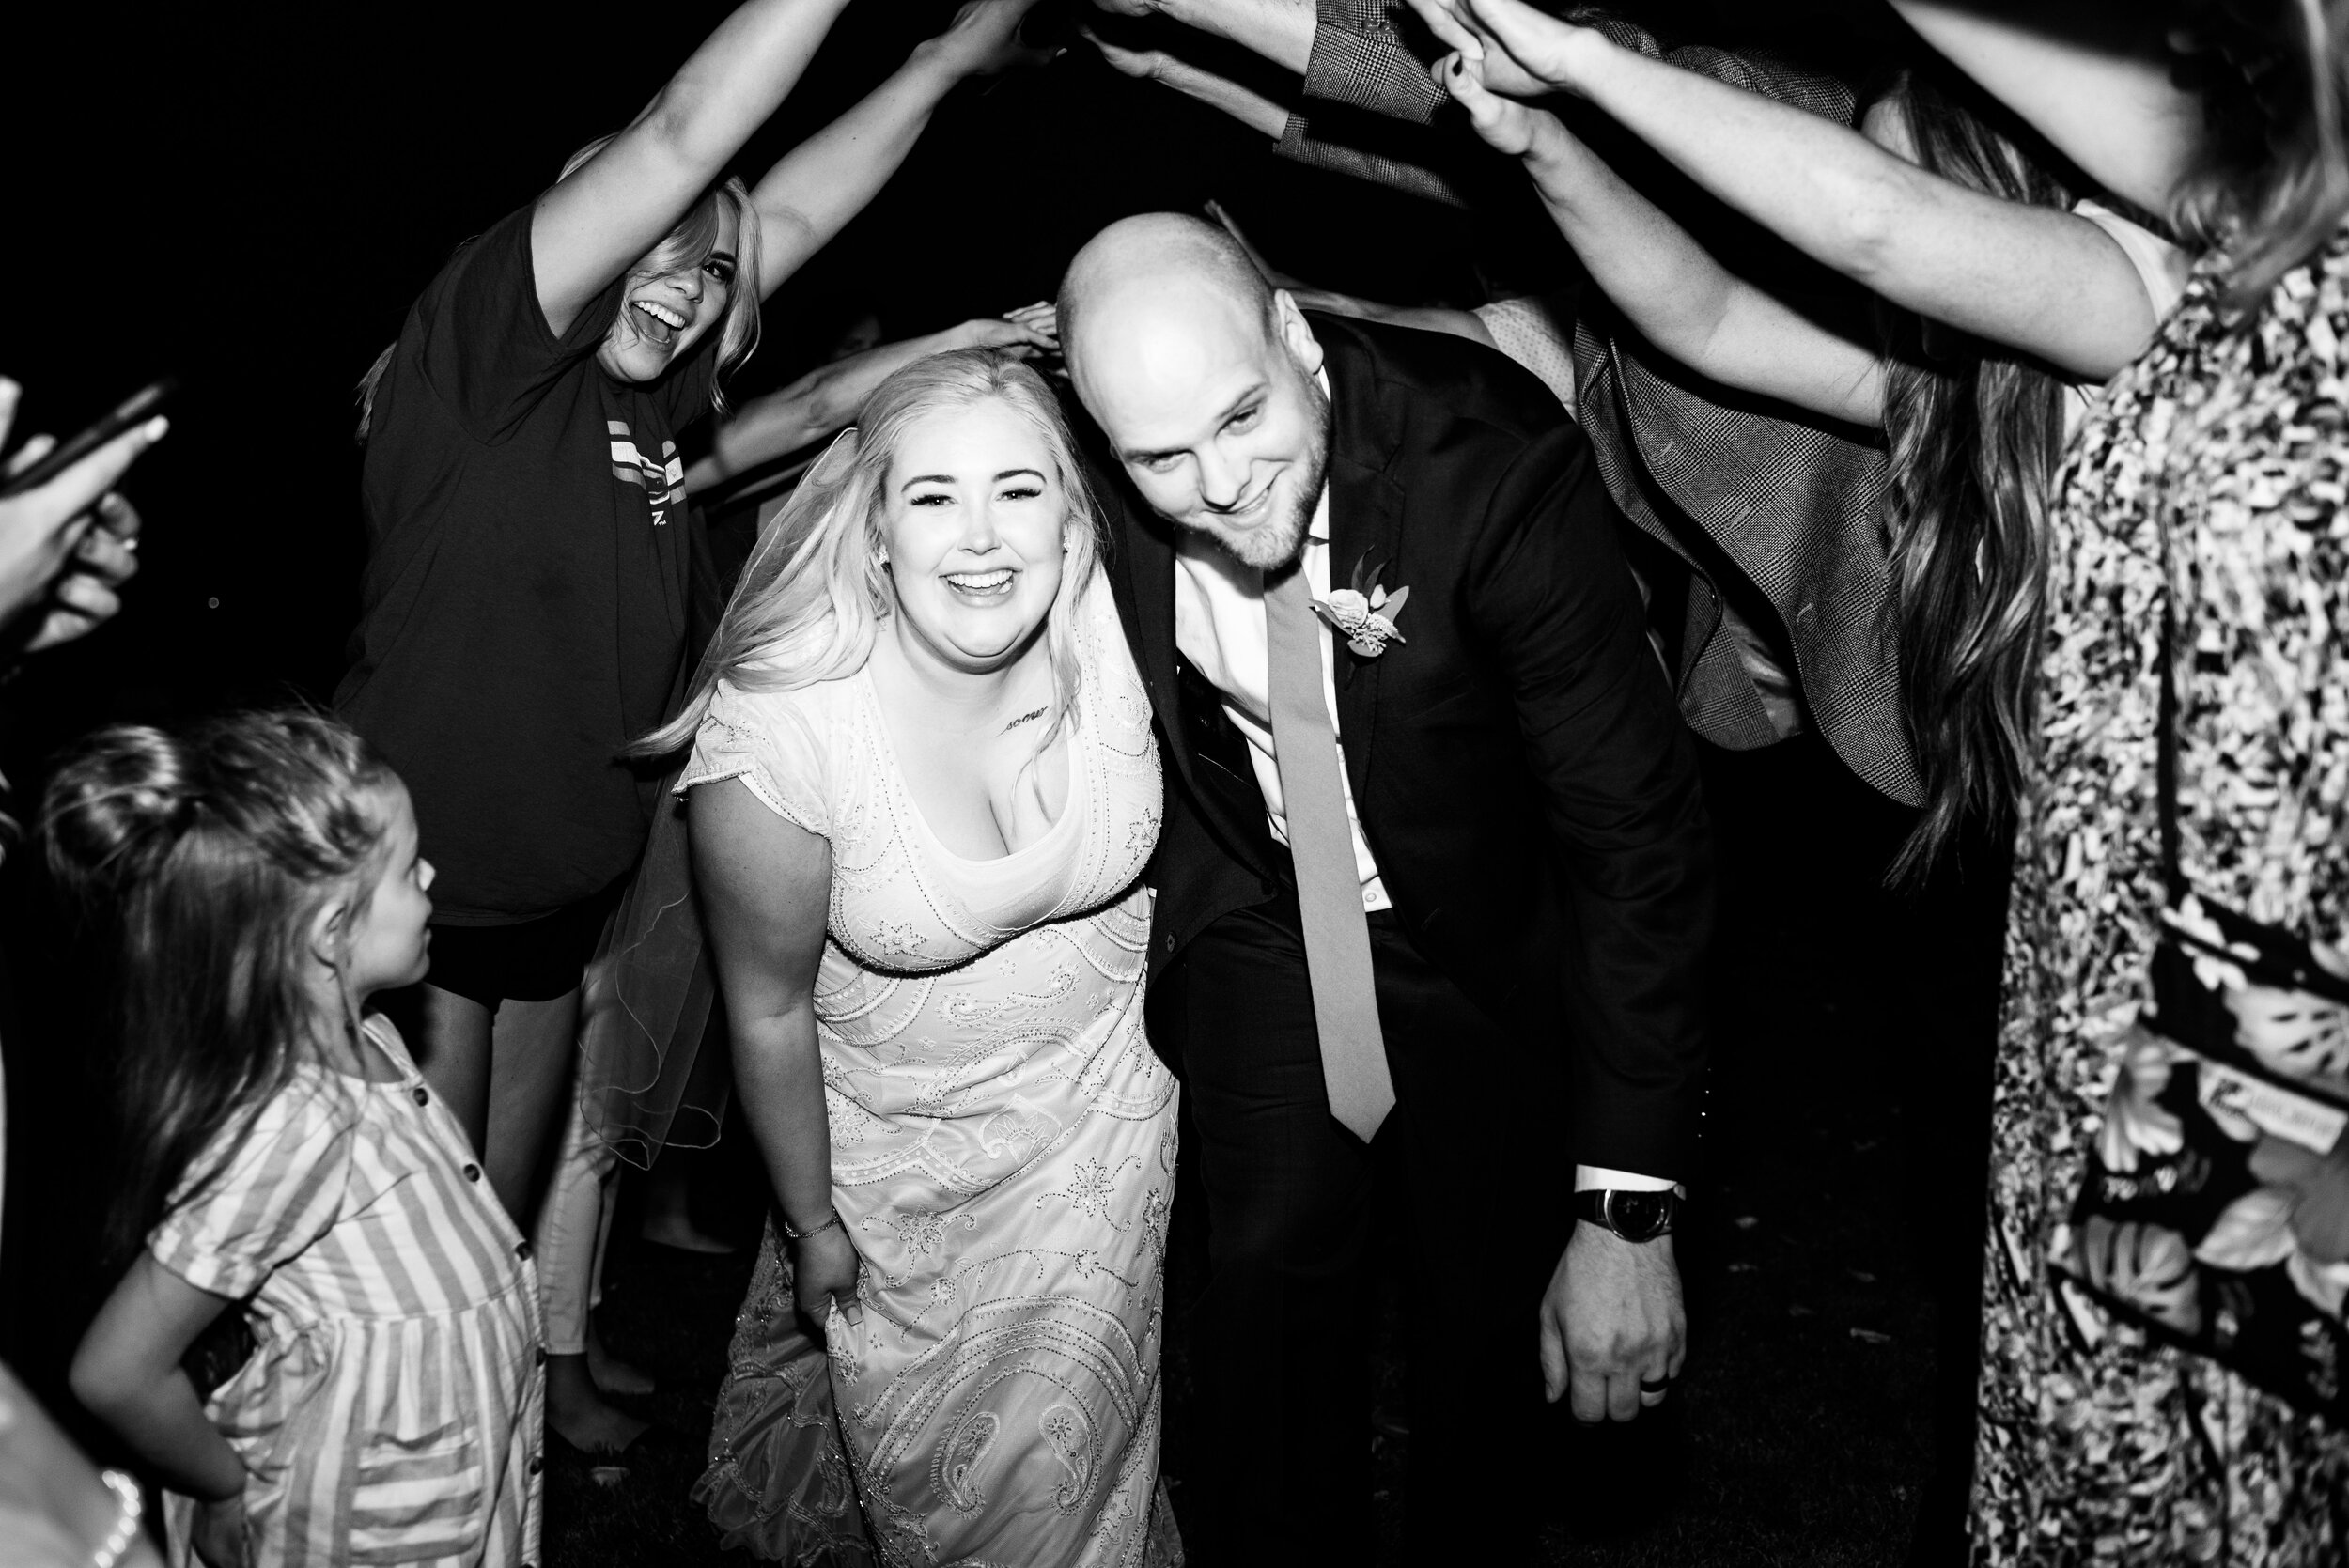 Bride & Groom Exit Tunnel - Tri Cities Wedding Photographer - Morgan Tayler Photo & Design - Tri Cities Washington Backyard Wedding